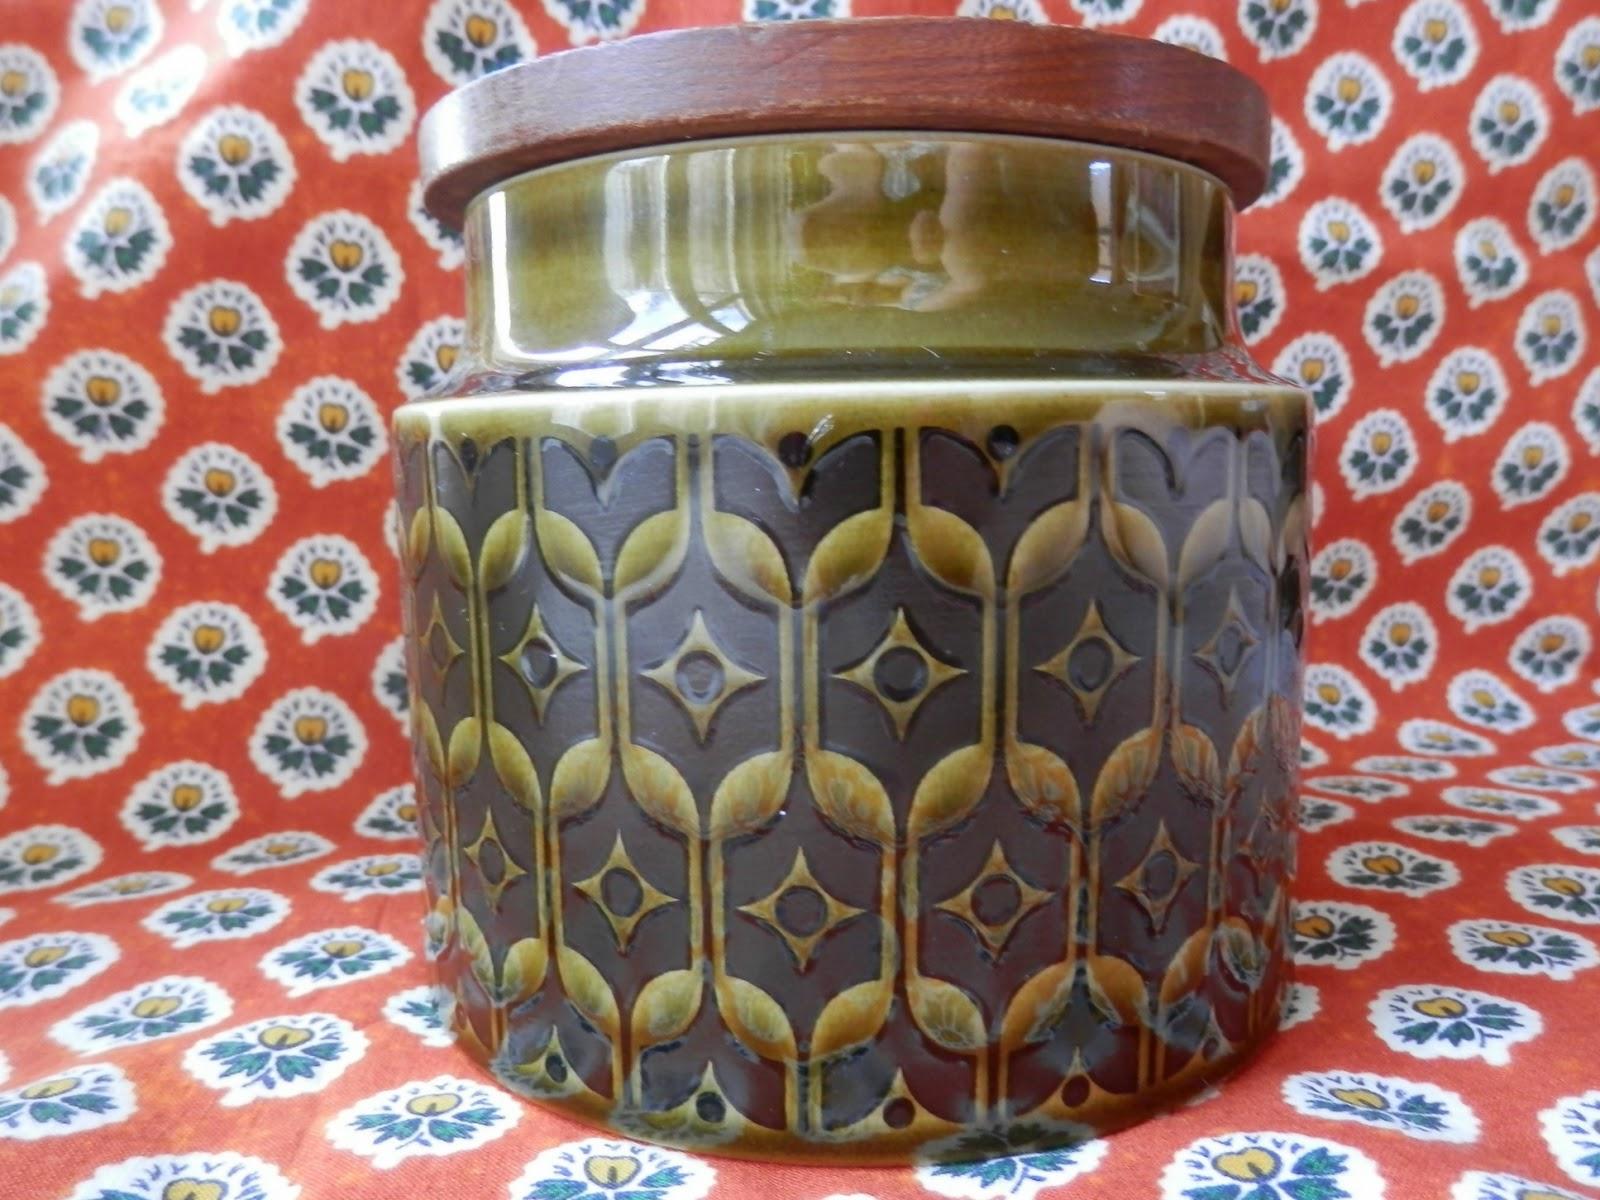 Charity Shop Treasure, Miserable Worm Toy and Hornsea Green Heirloom Jar